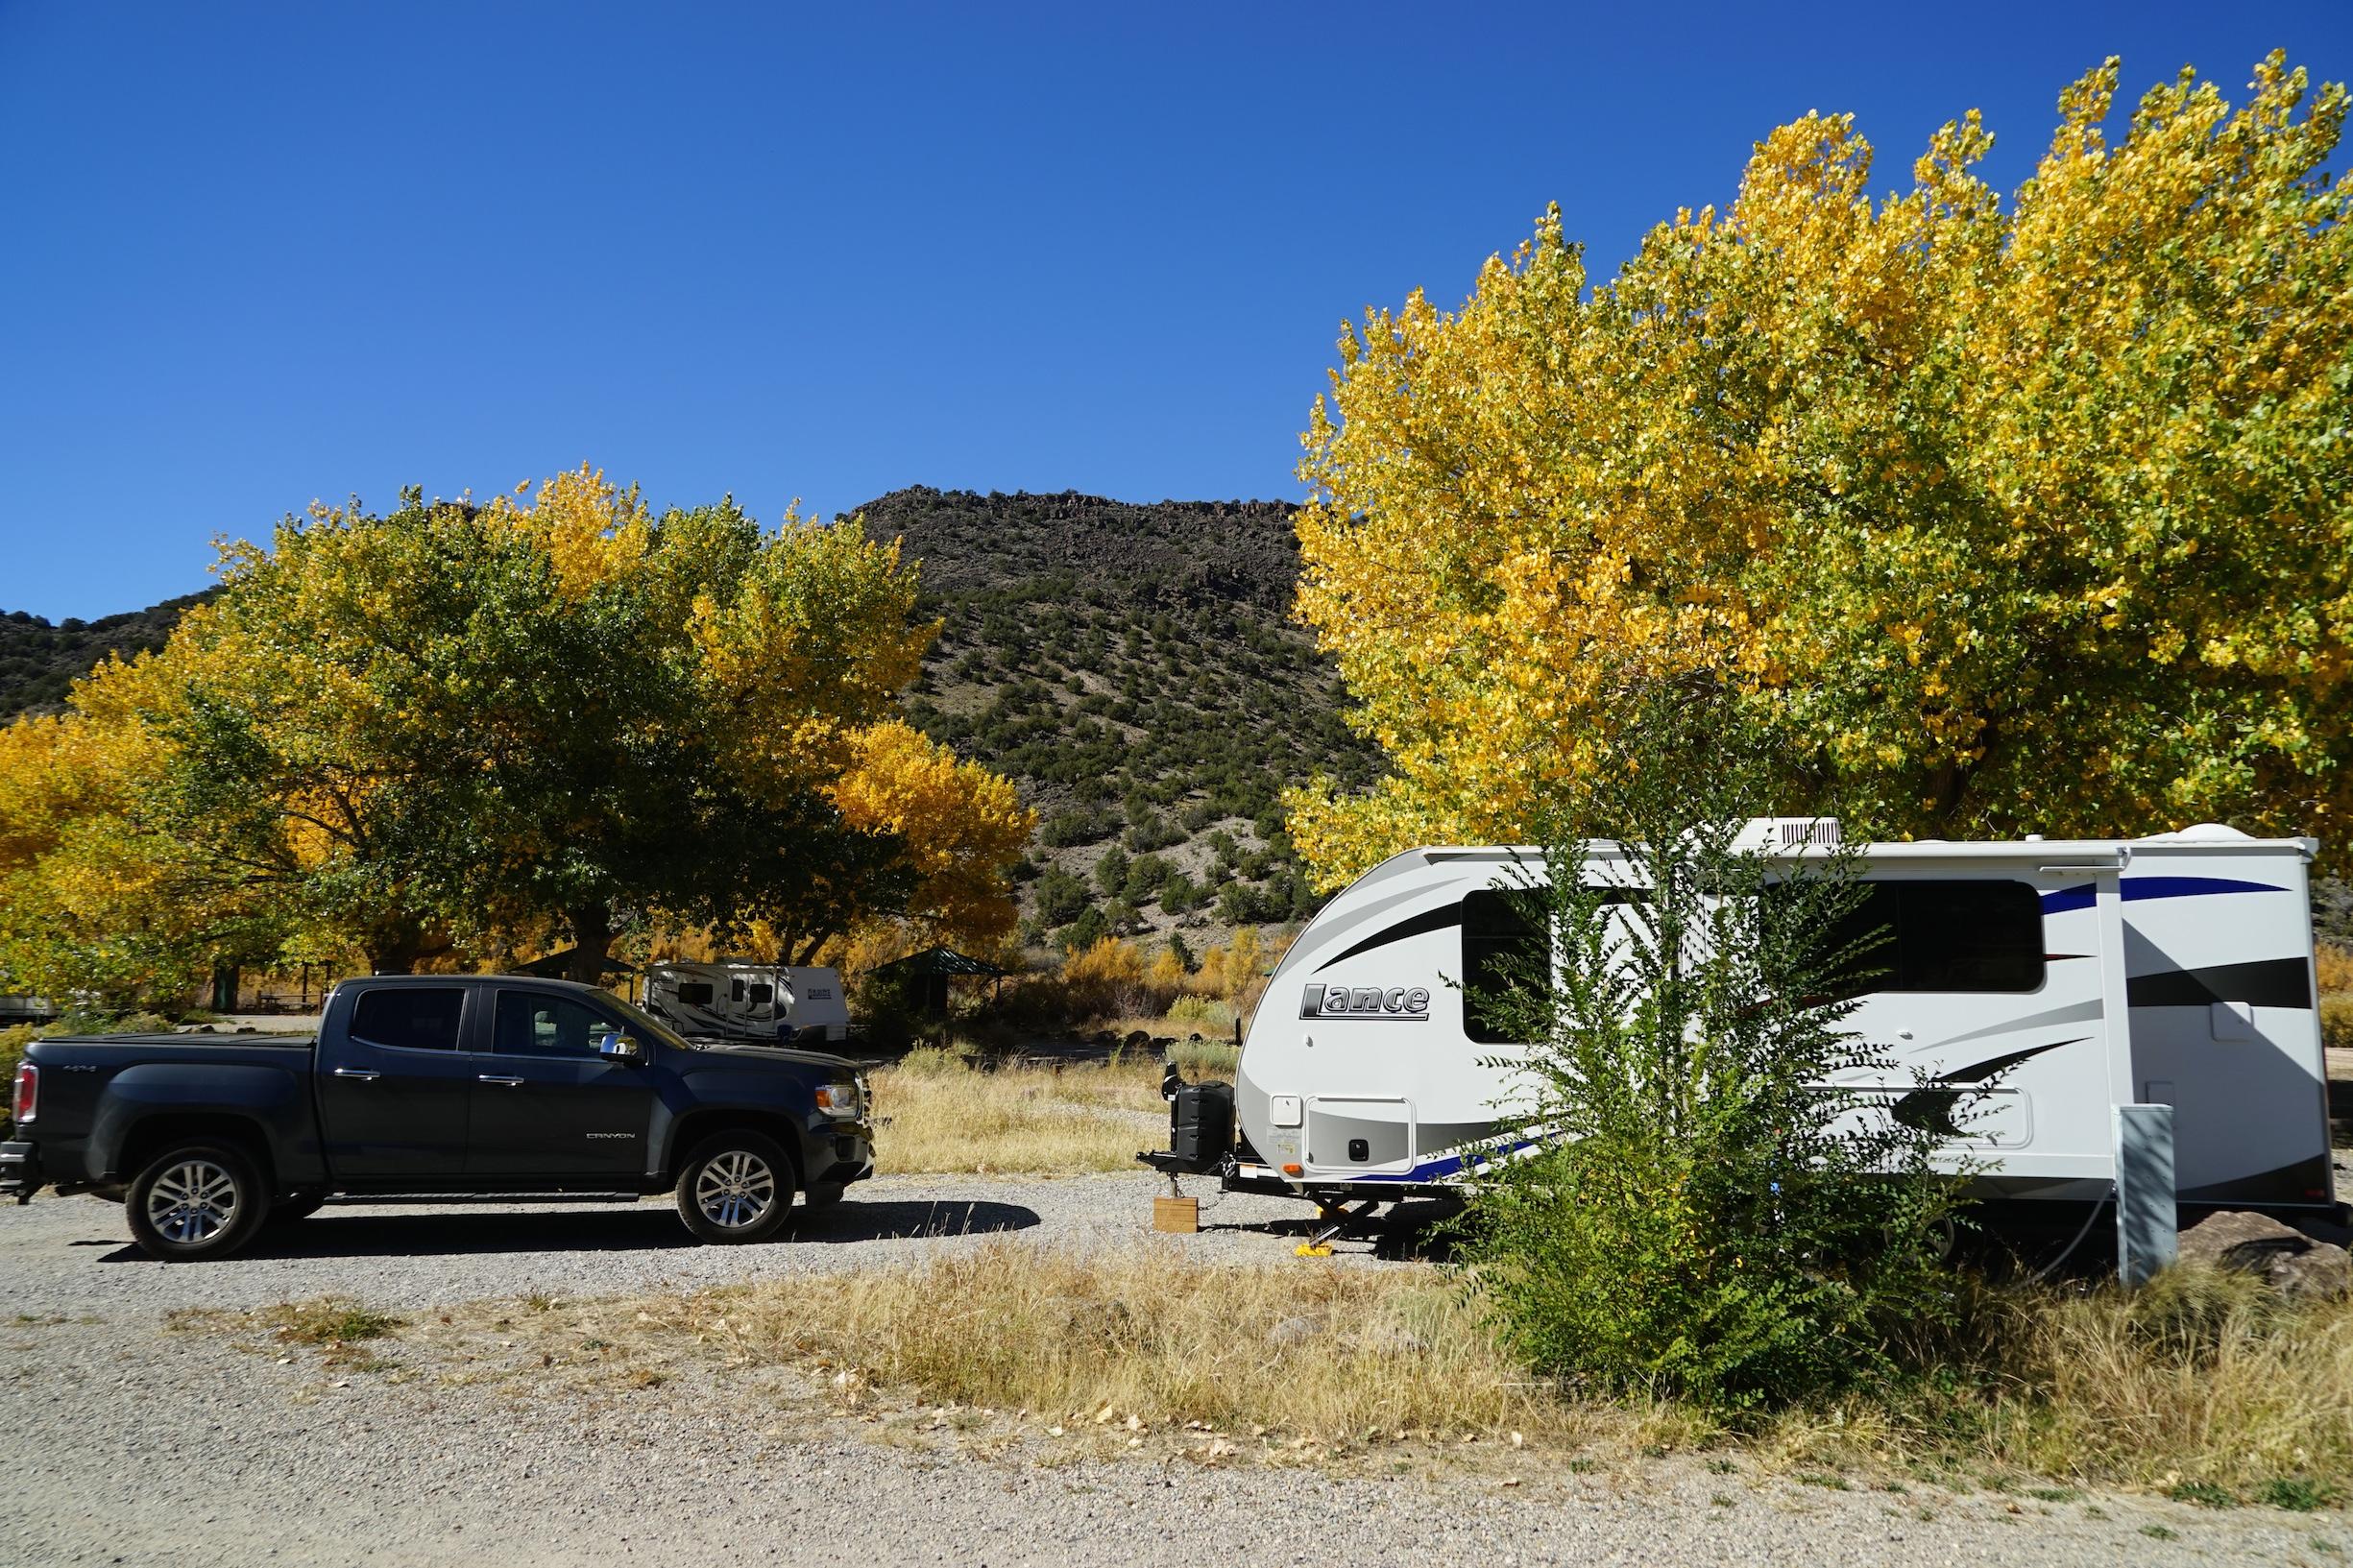 Camping in  Rio Grande del Norte National Monument